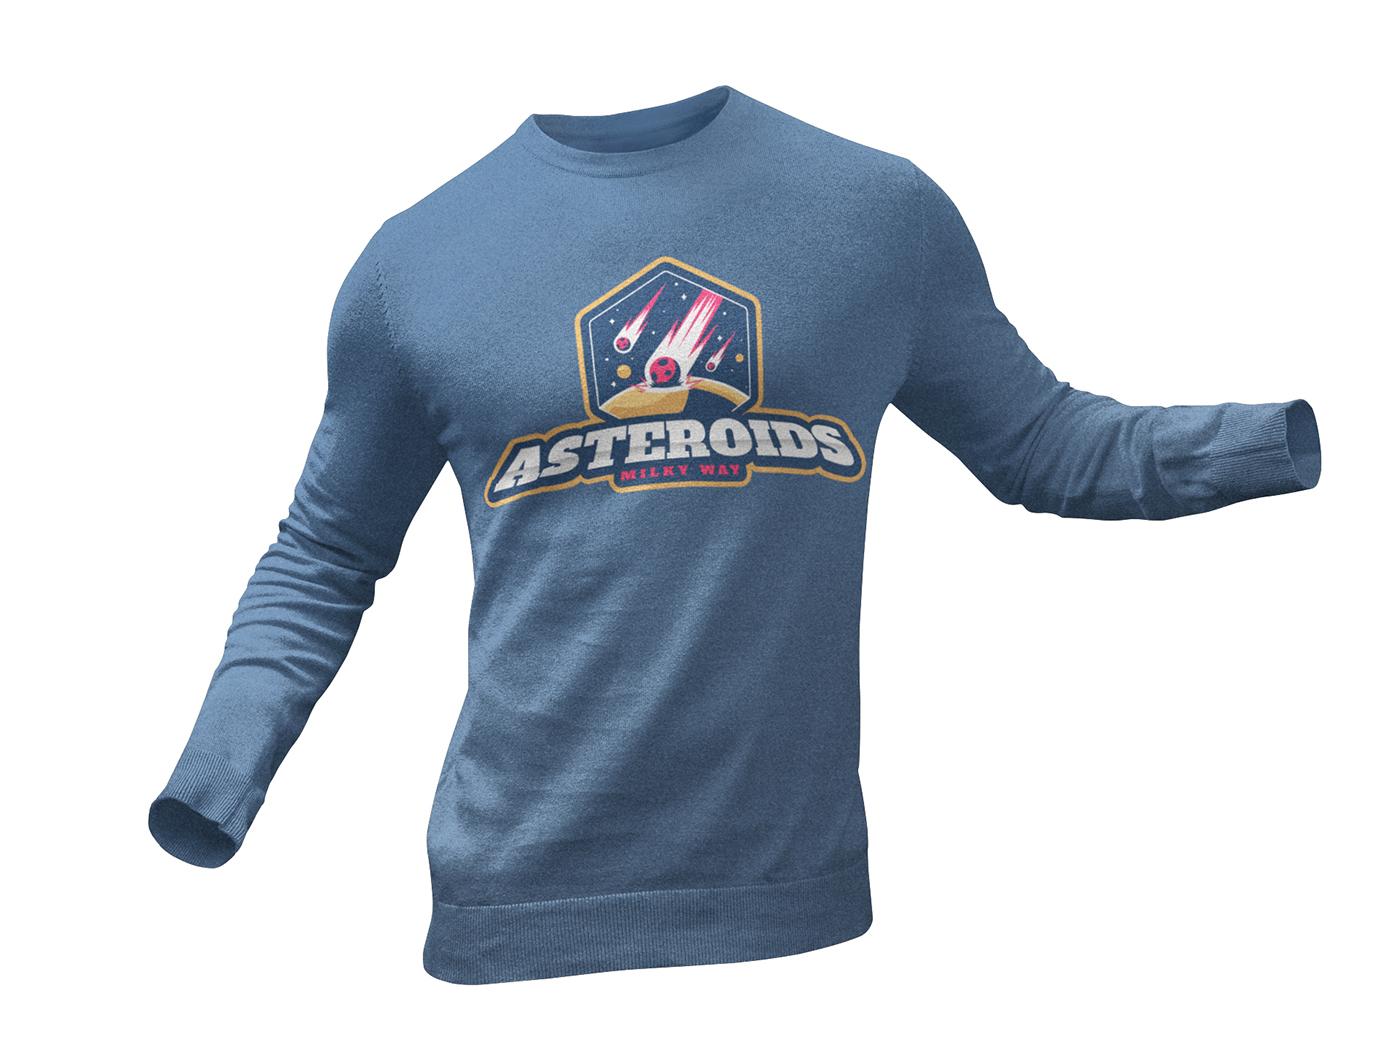 Free sweatshirt mockup psd on behance file type psd maxwellsz